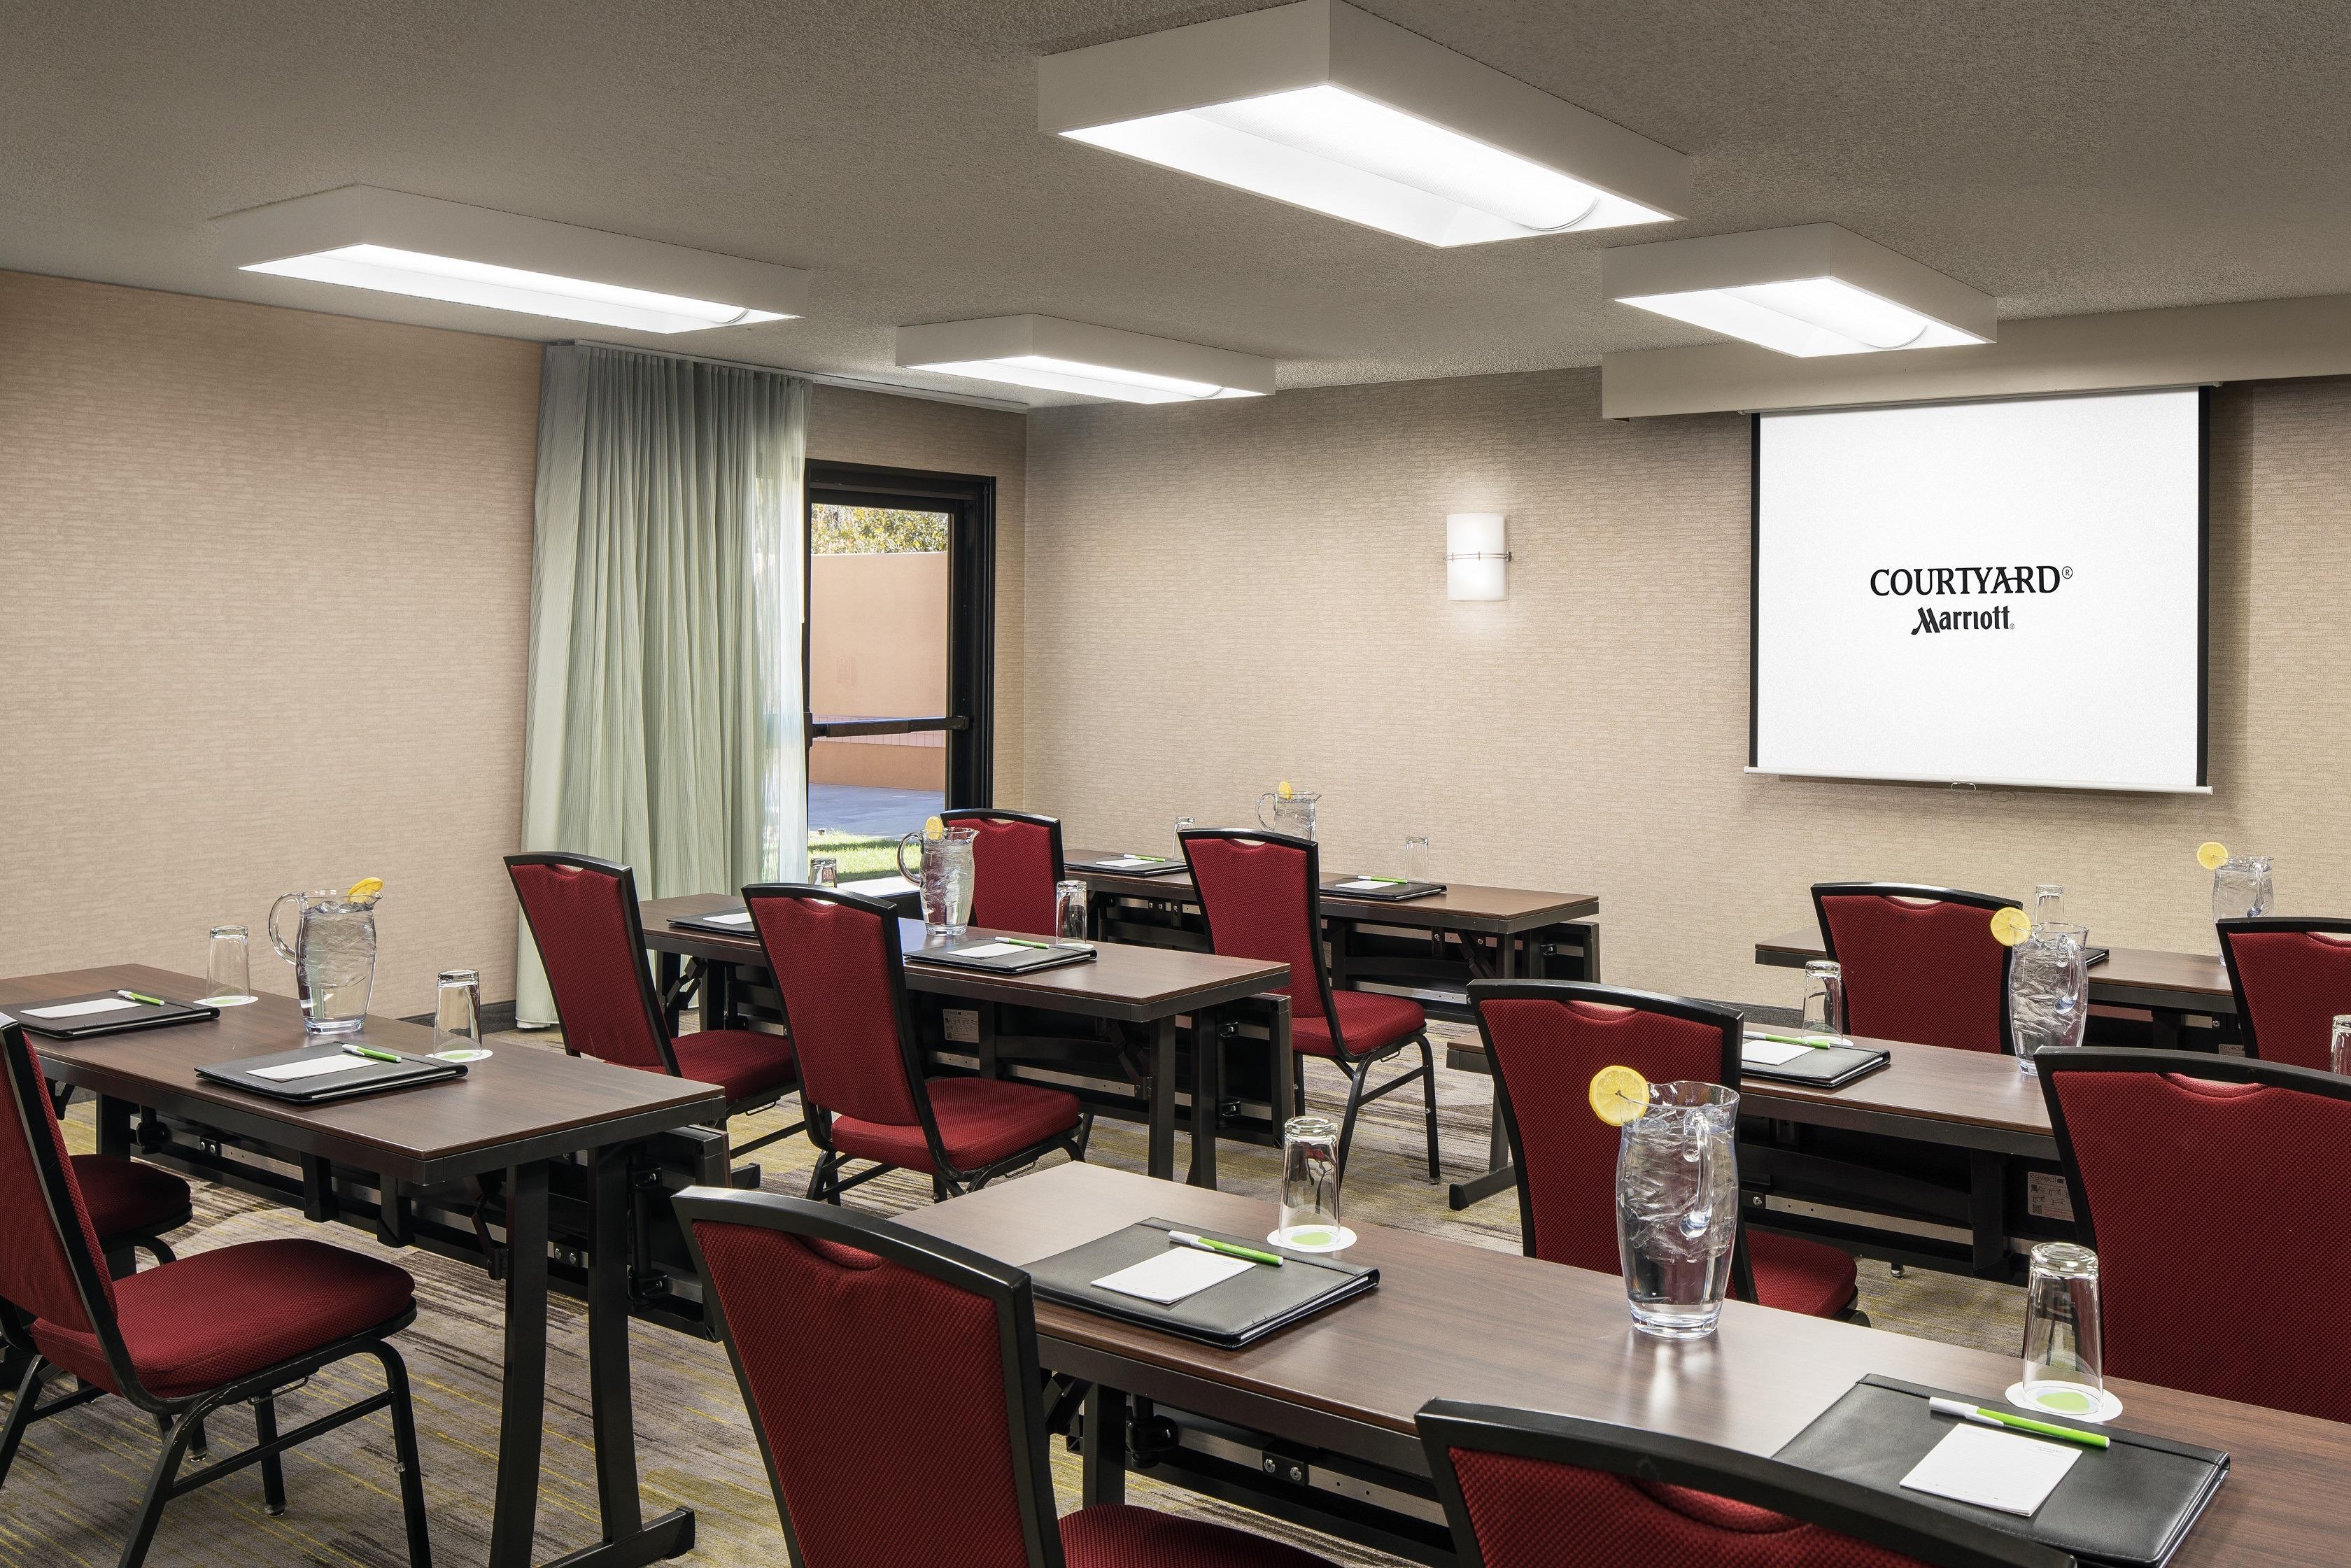 Courtyard Irvine John Wayne Airport/Orange County Meeting Space - Classroom Setup